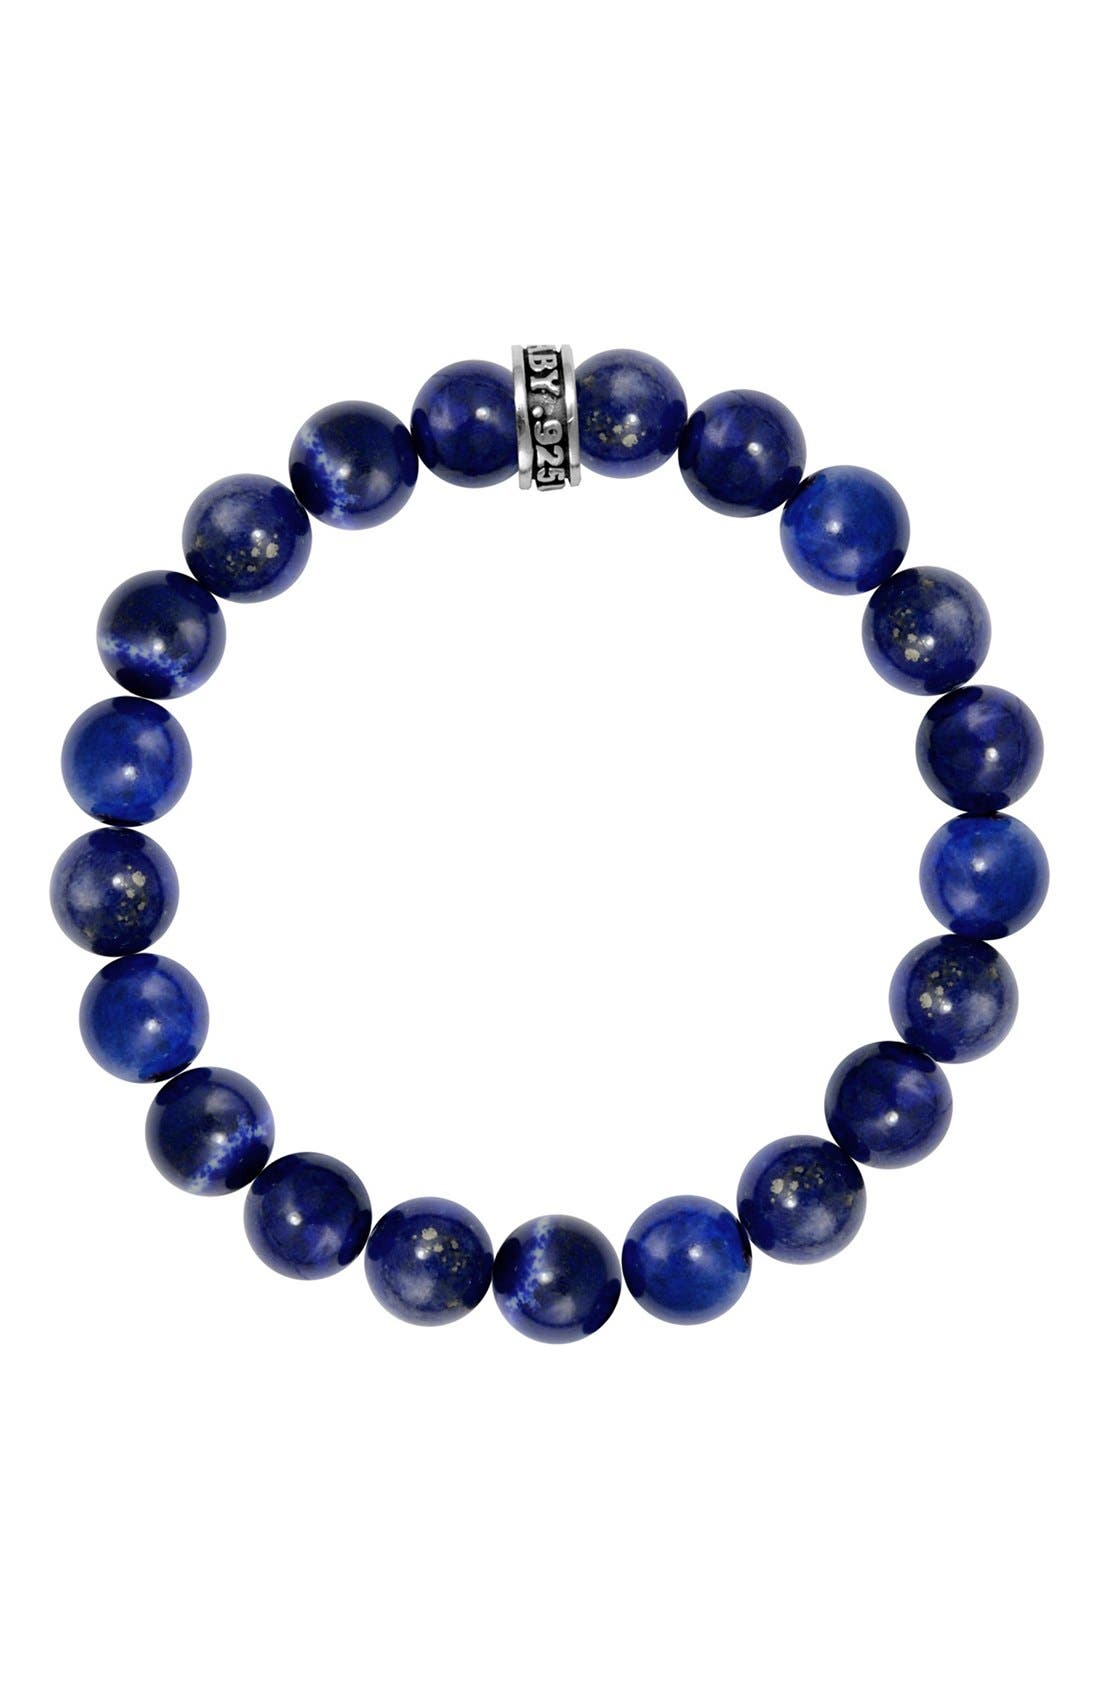 KING BABY Lapis Lazuli Bead Bracelet